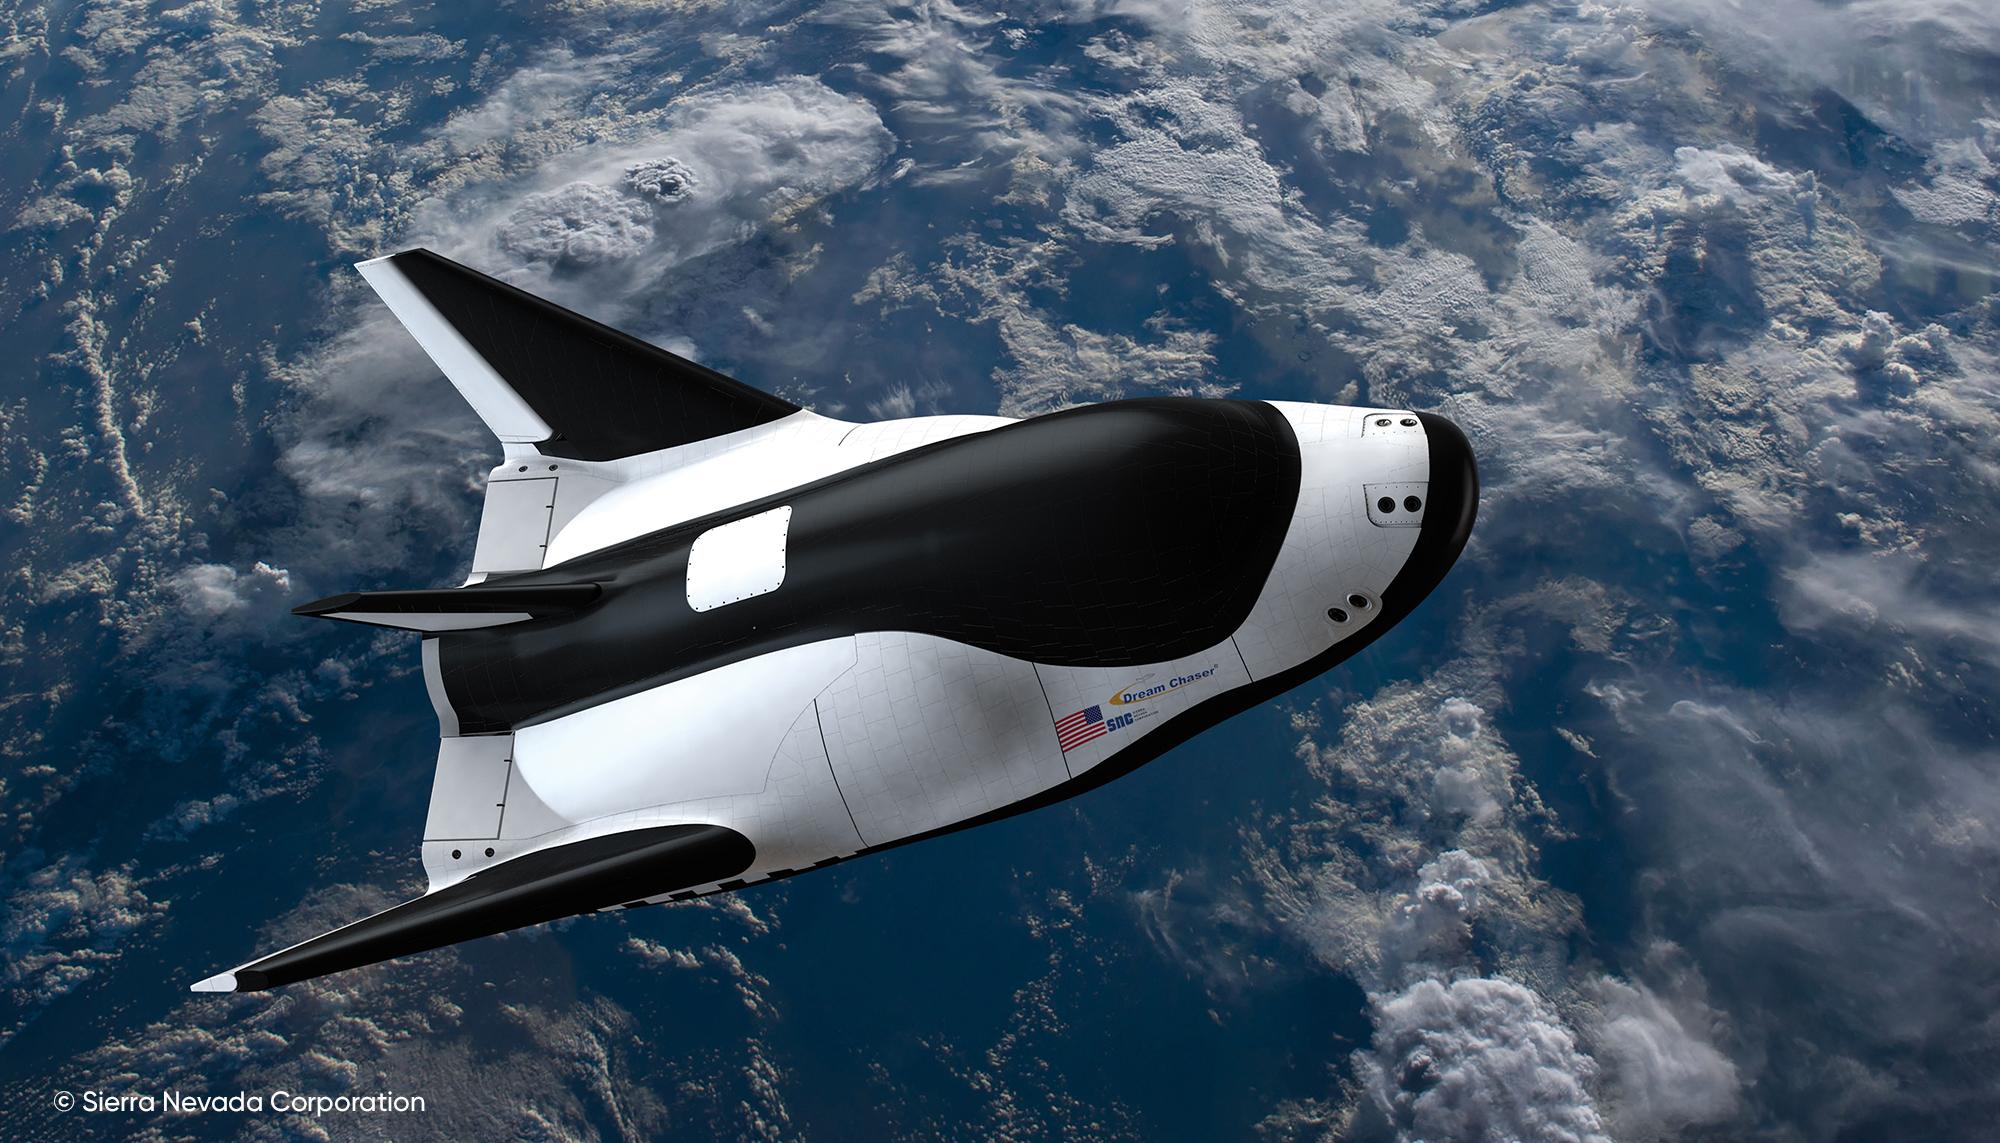 Illustration de l'artiste de l'avion spatial Dream Chaser de la Sierra Nevada en orbite.